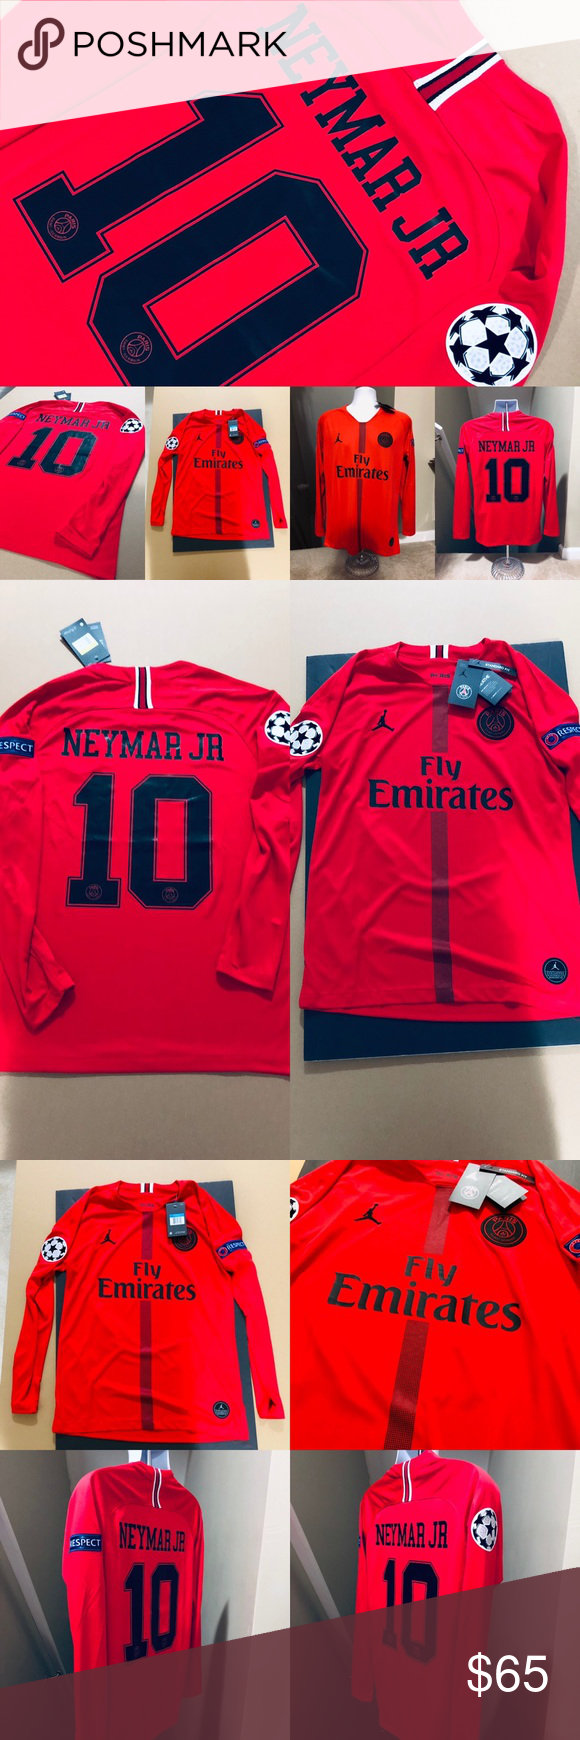 new product e68f3 16679 2019 Jordan ⚽️ PSG Neymar Jr #10 Soccer Jersey 🚨 2019 ...